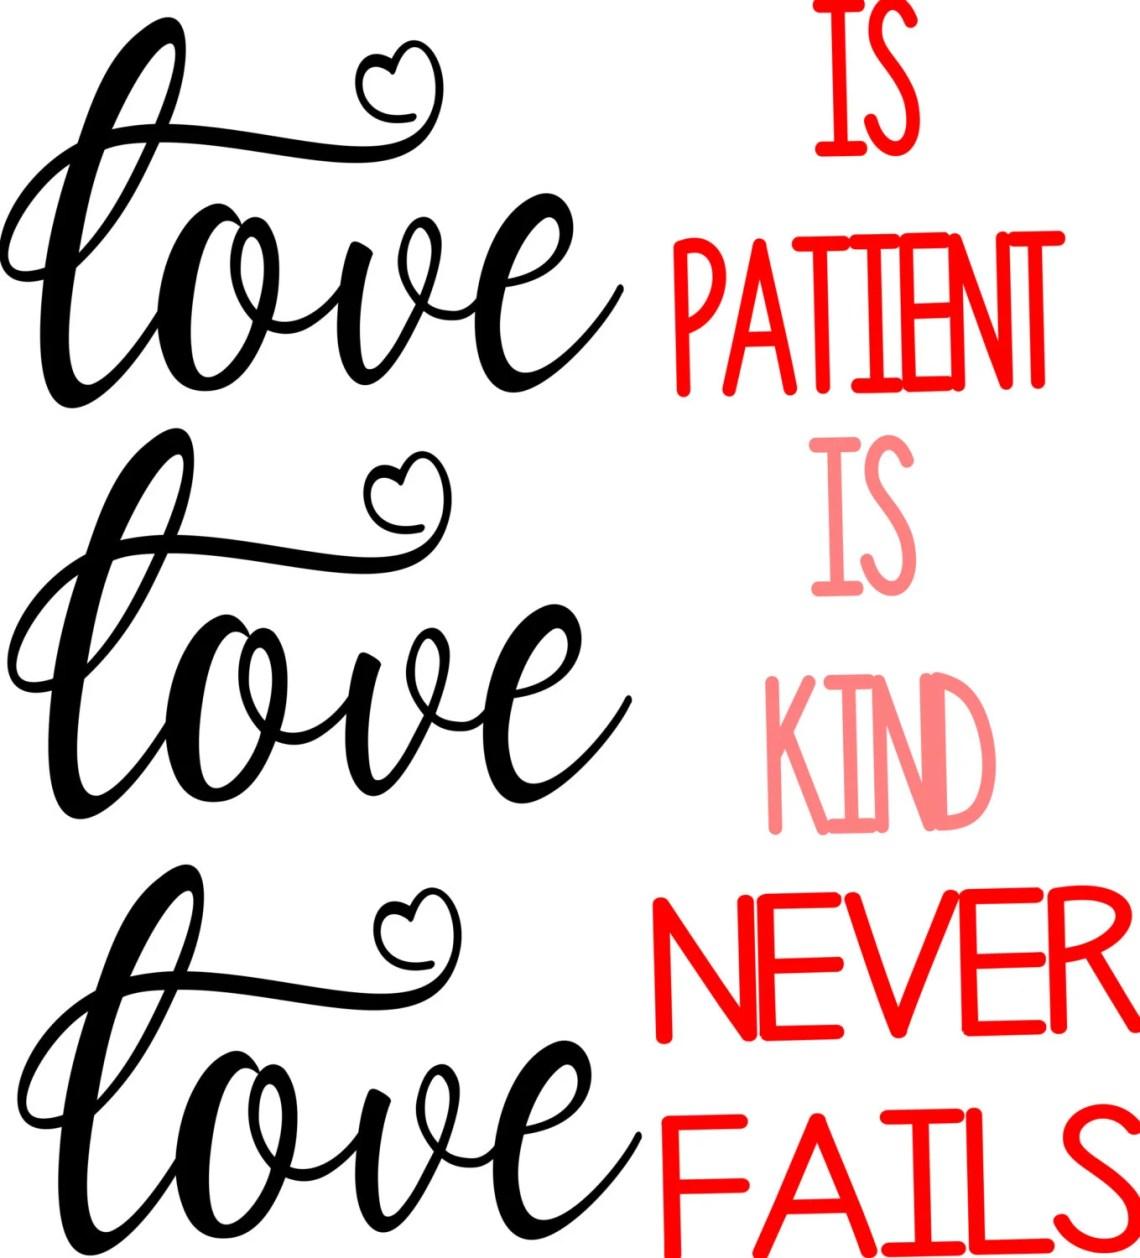 Download Love is Patient Cut File SVG by ArtForTheMostPart on Etsy